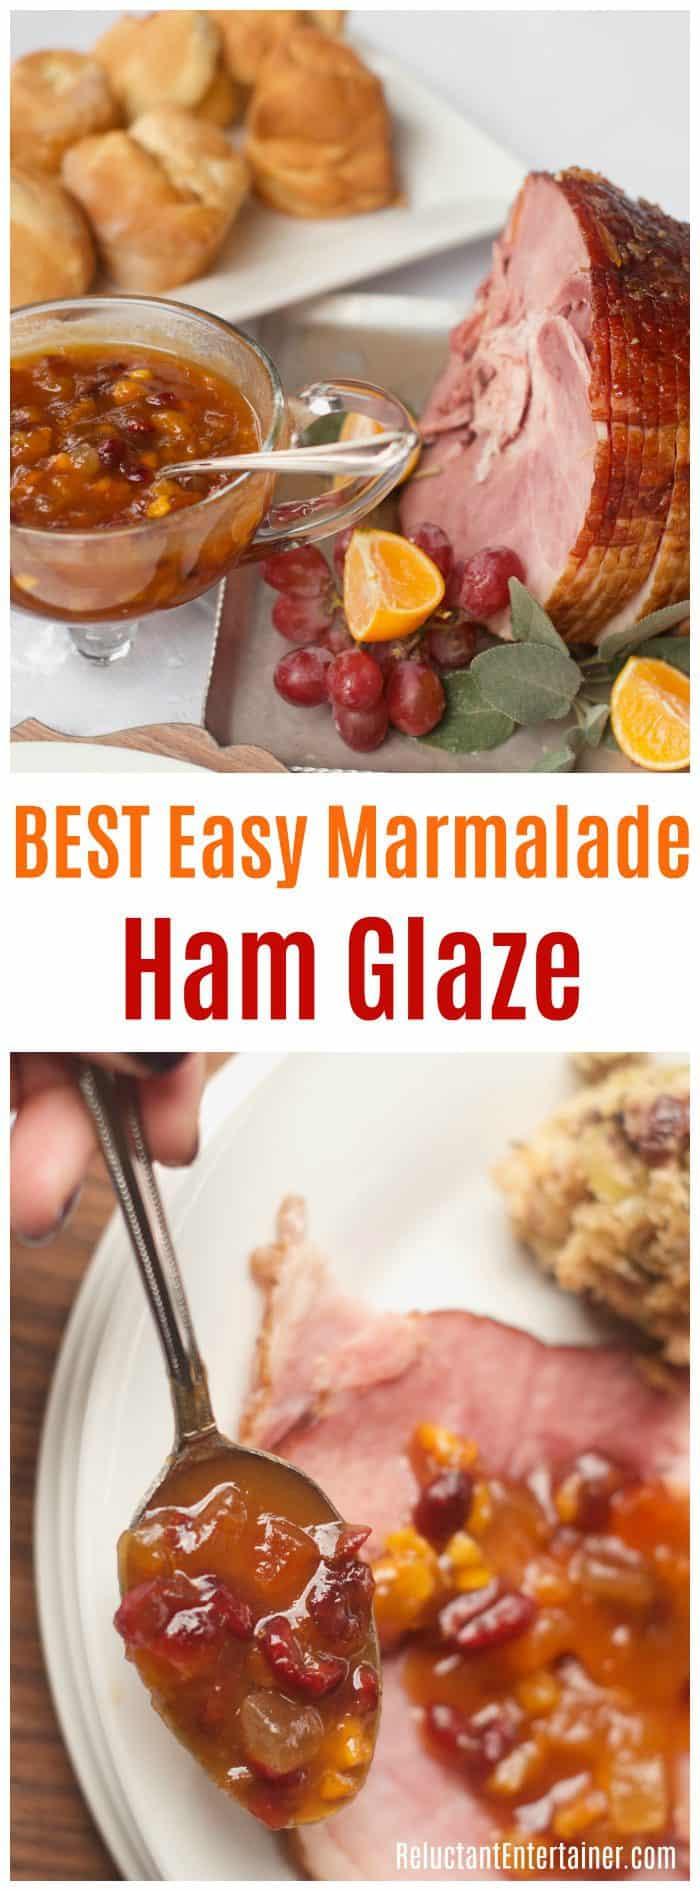 BEST Easy Marmalade Ham Glaze Recipe for holiday entertaining